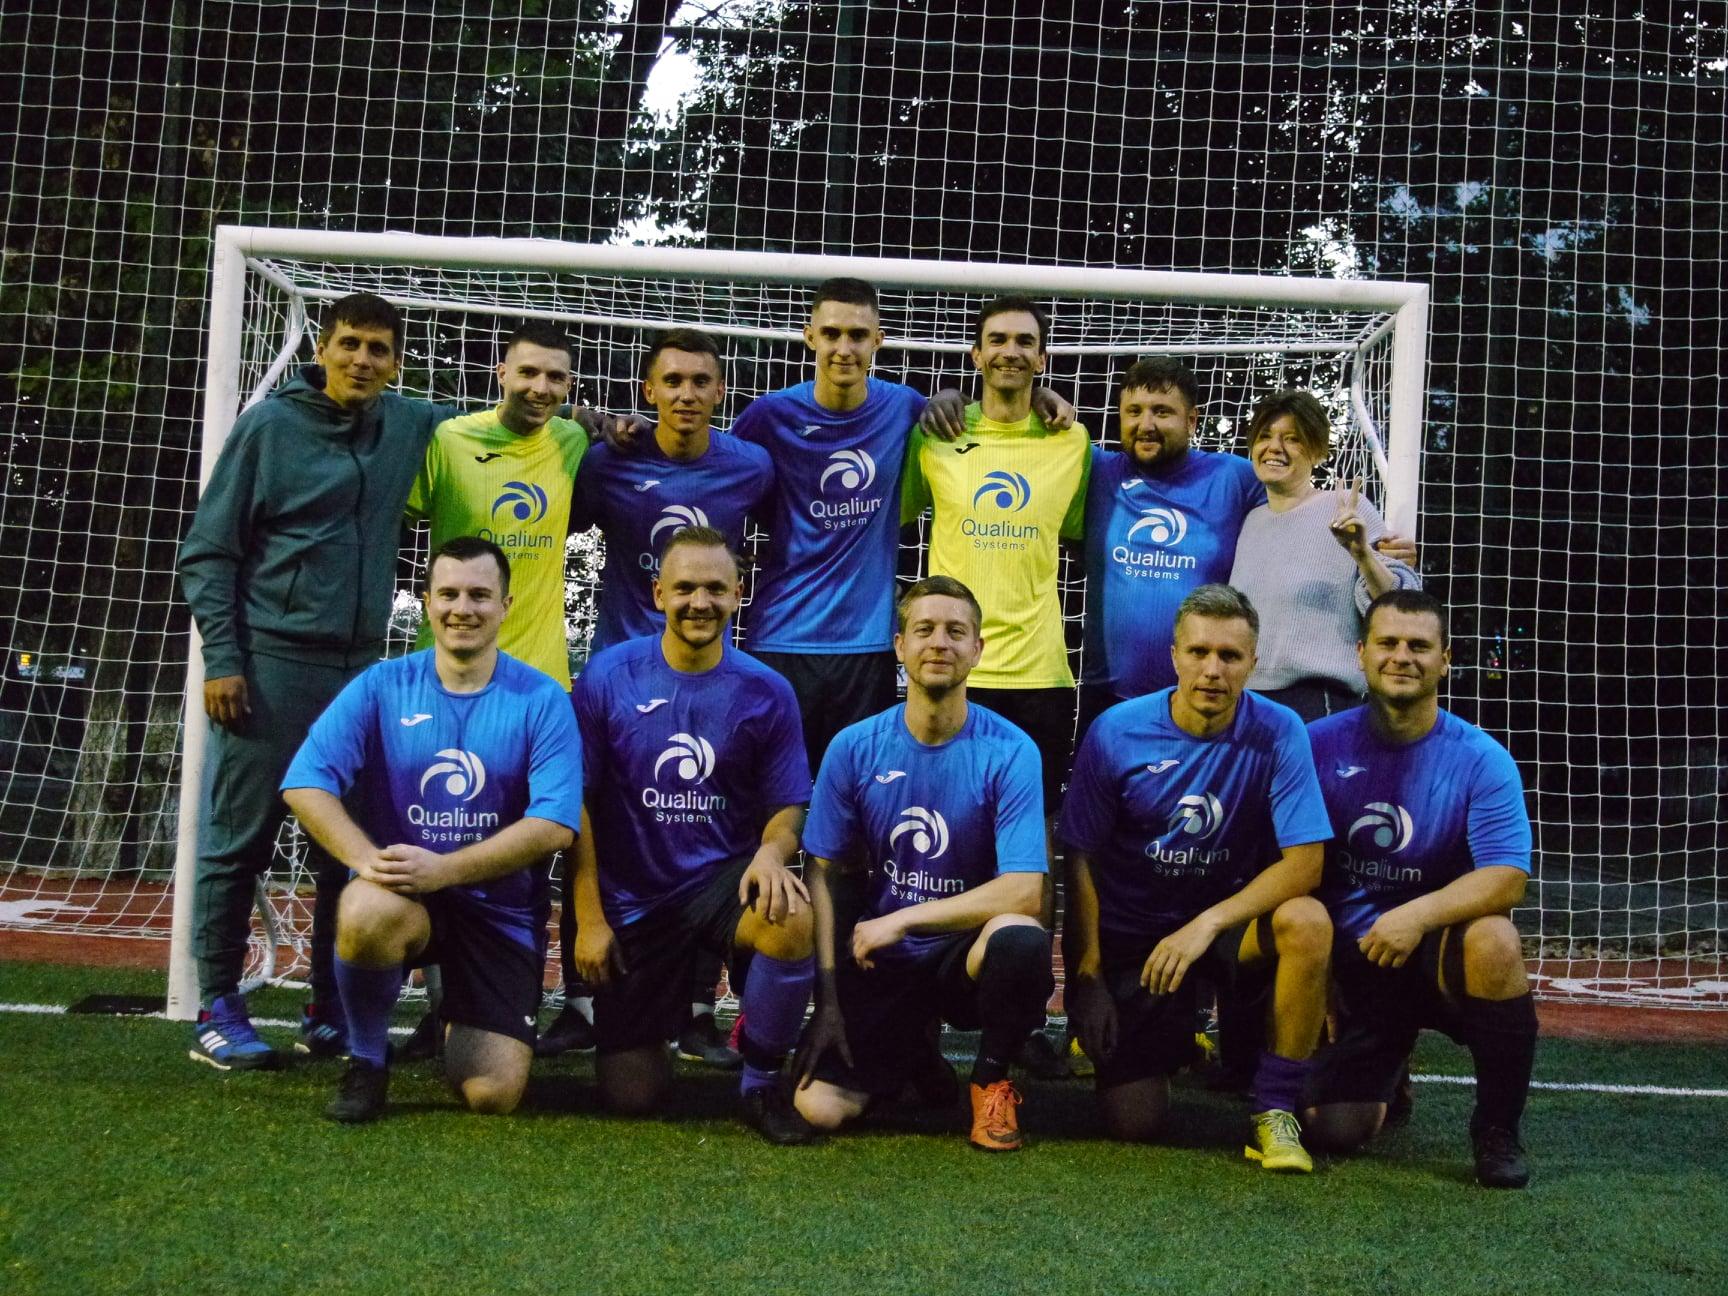 The Qualium Systems futsal team has advanced to the Senior IT League of Kharkiv